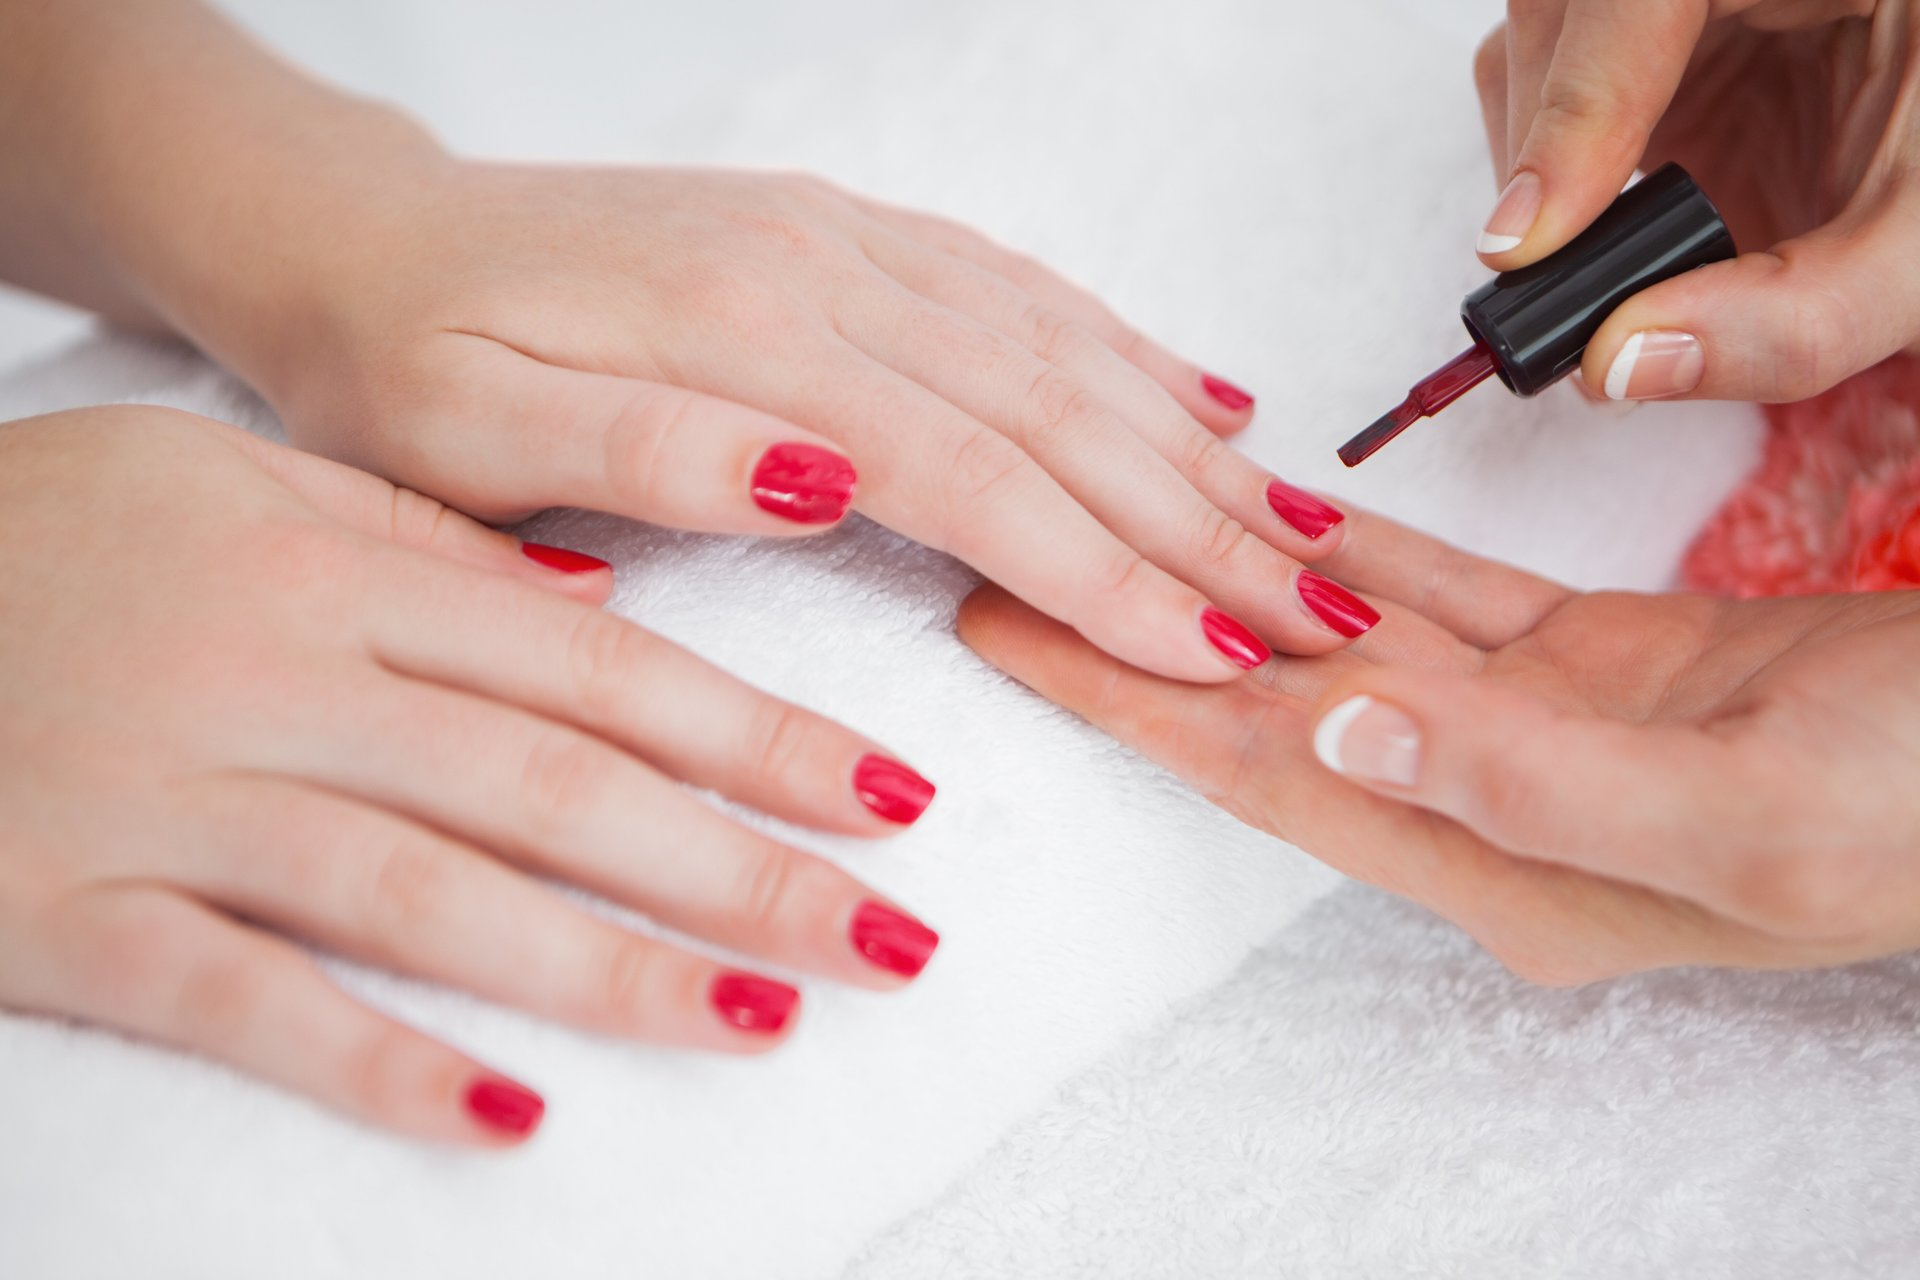 Nail repair services at our salon